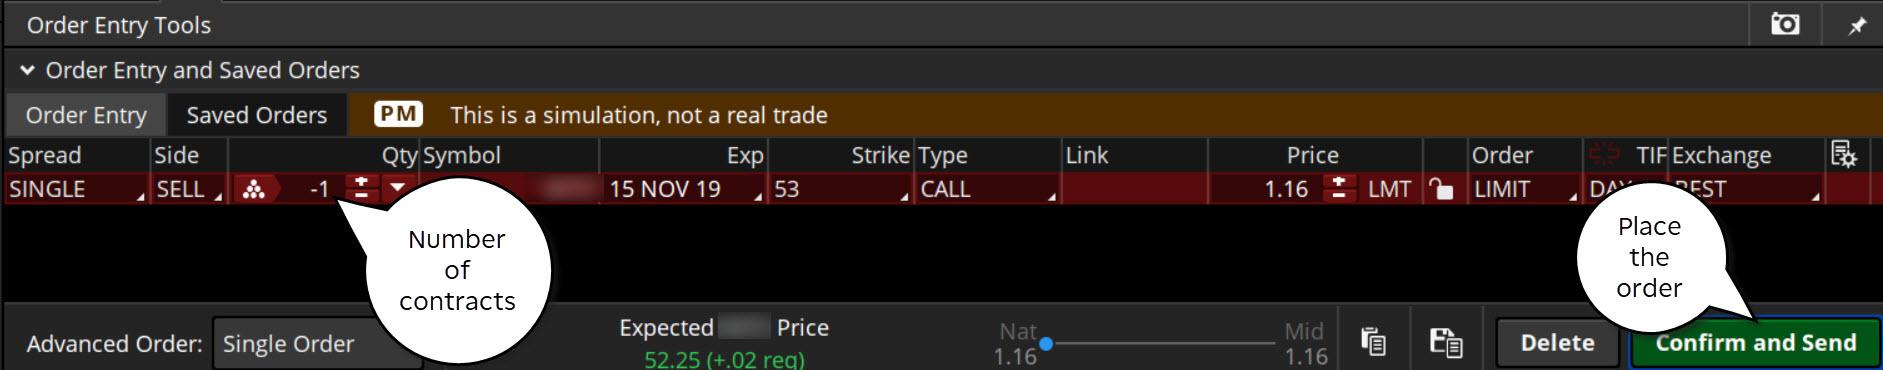 Td ameritrade binary options trading boxed horse race betting